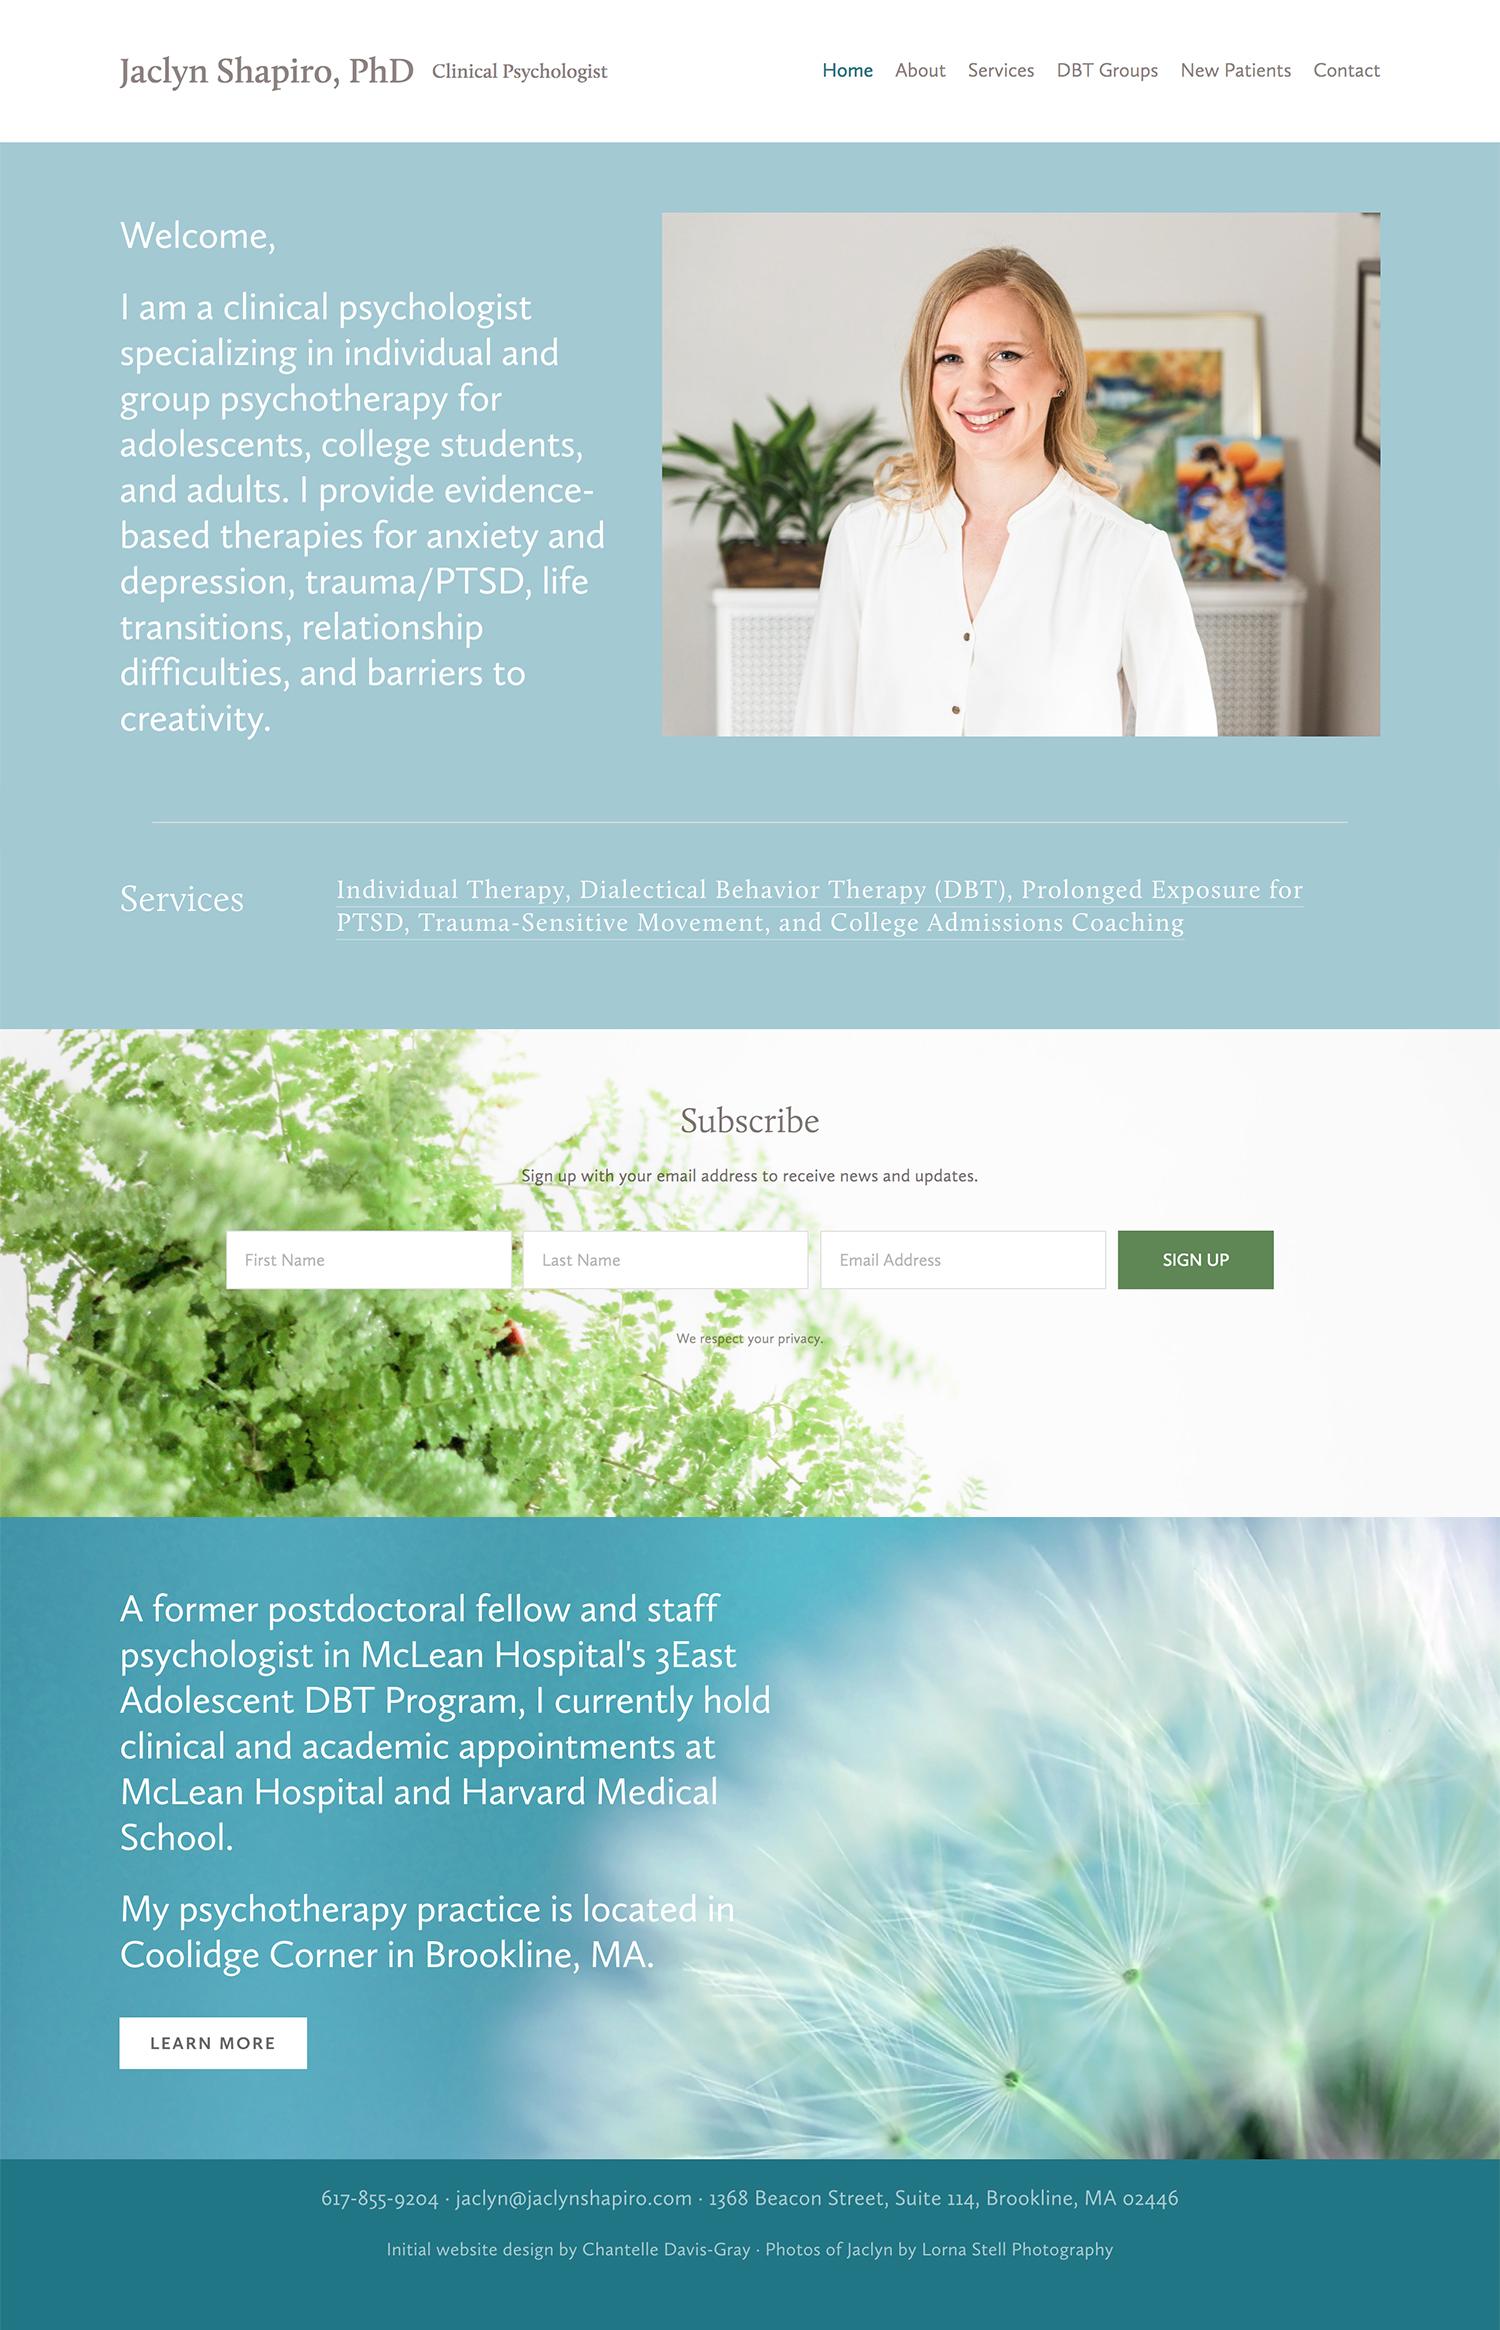 brookline psychologist's squarespace website